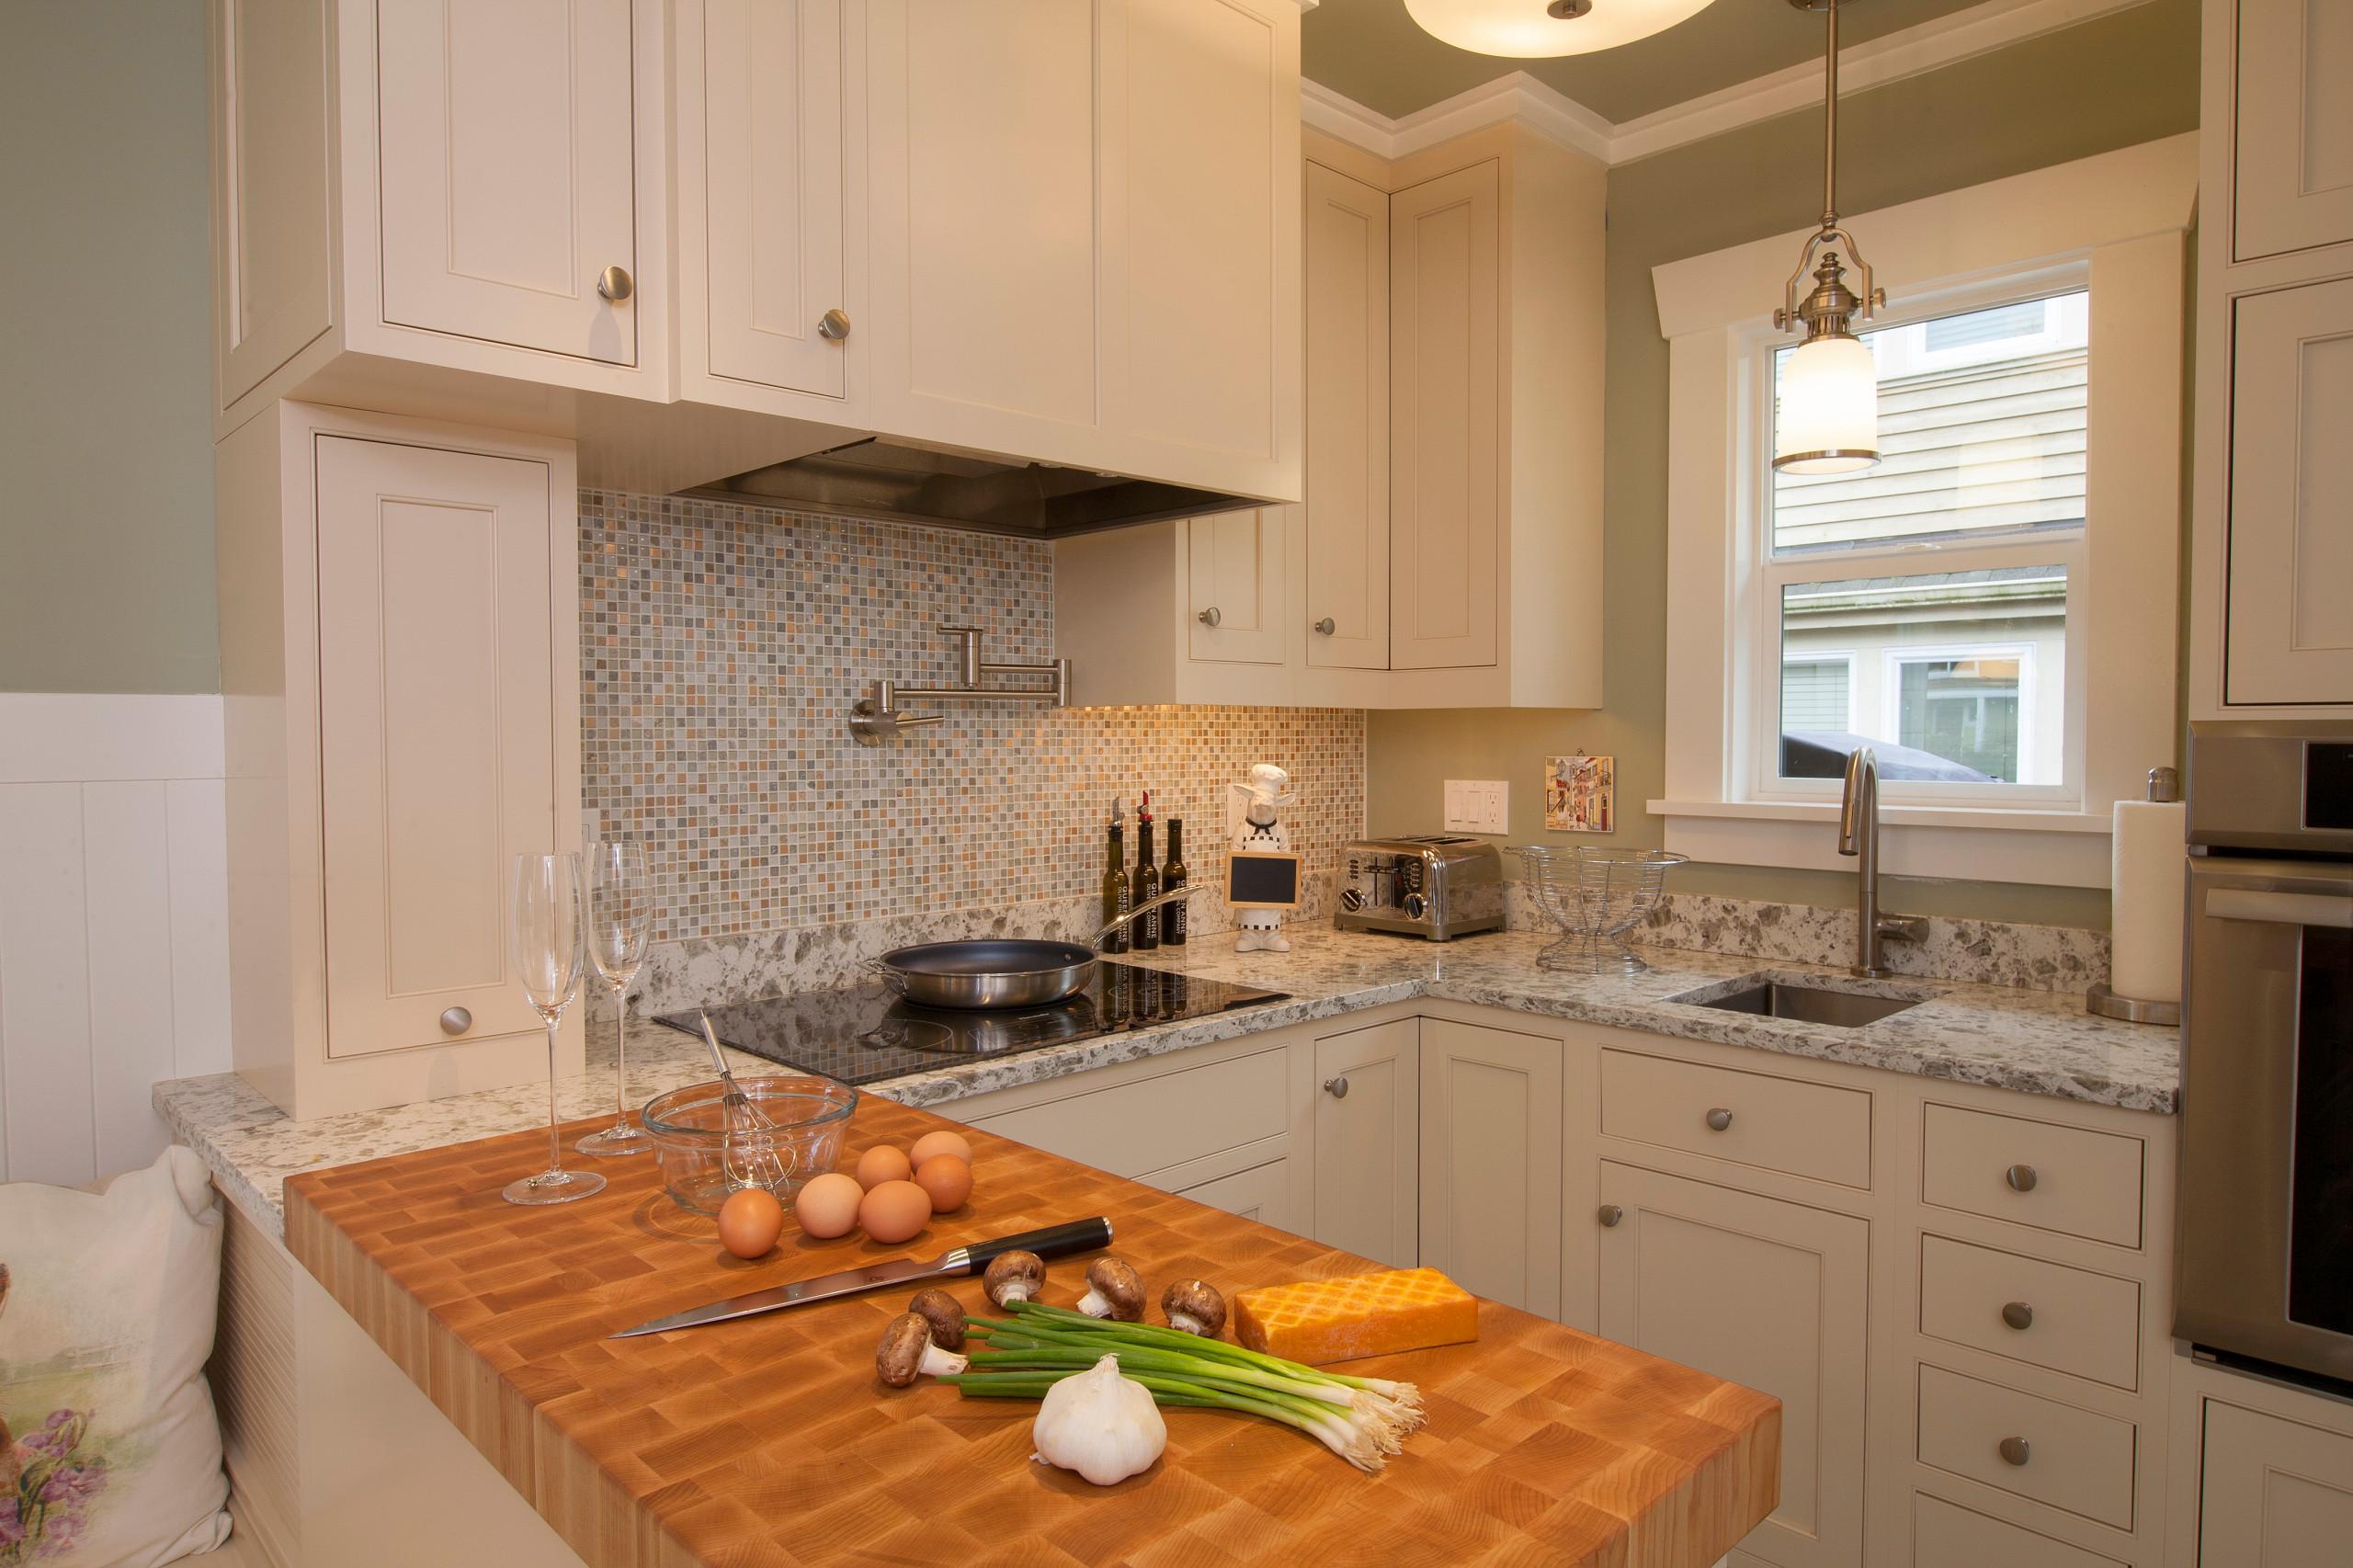 Wallingford Craftsman Kitchen Remodel - Home Birth Year 1924